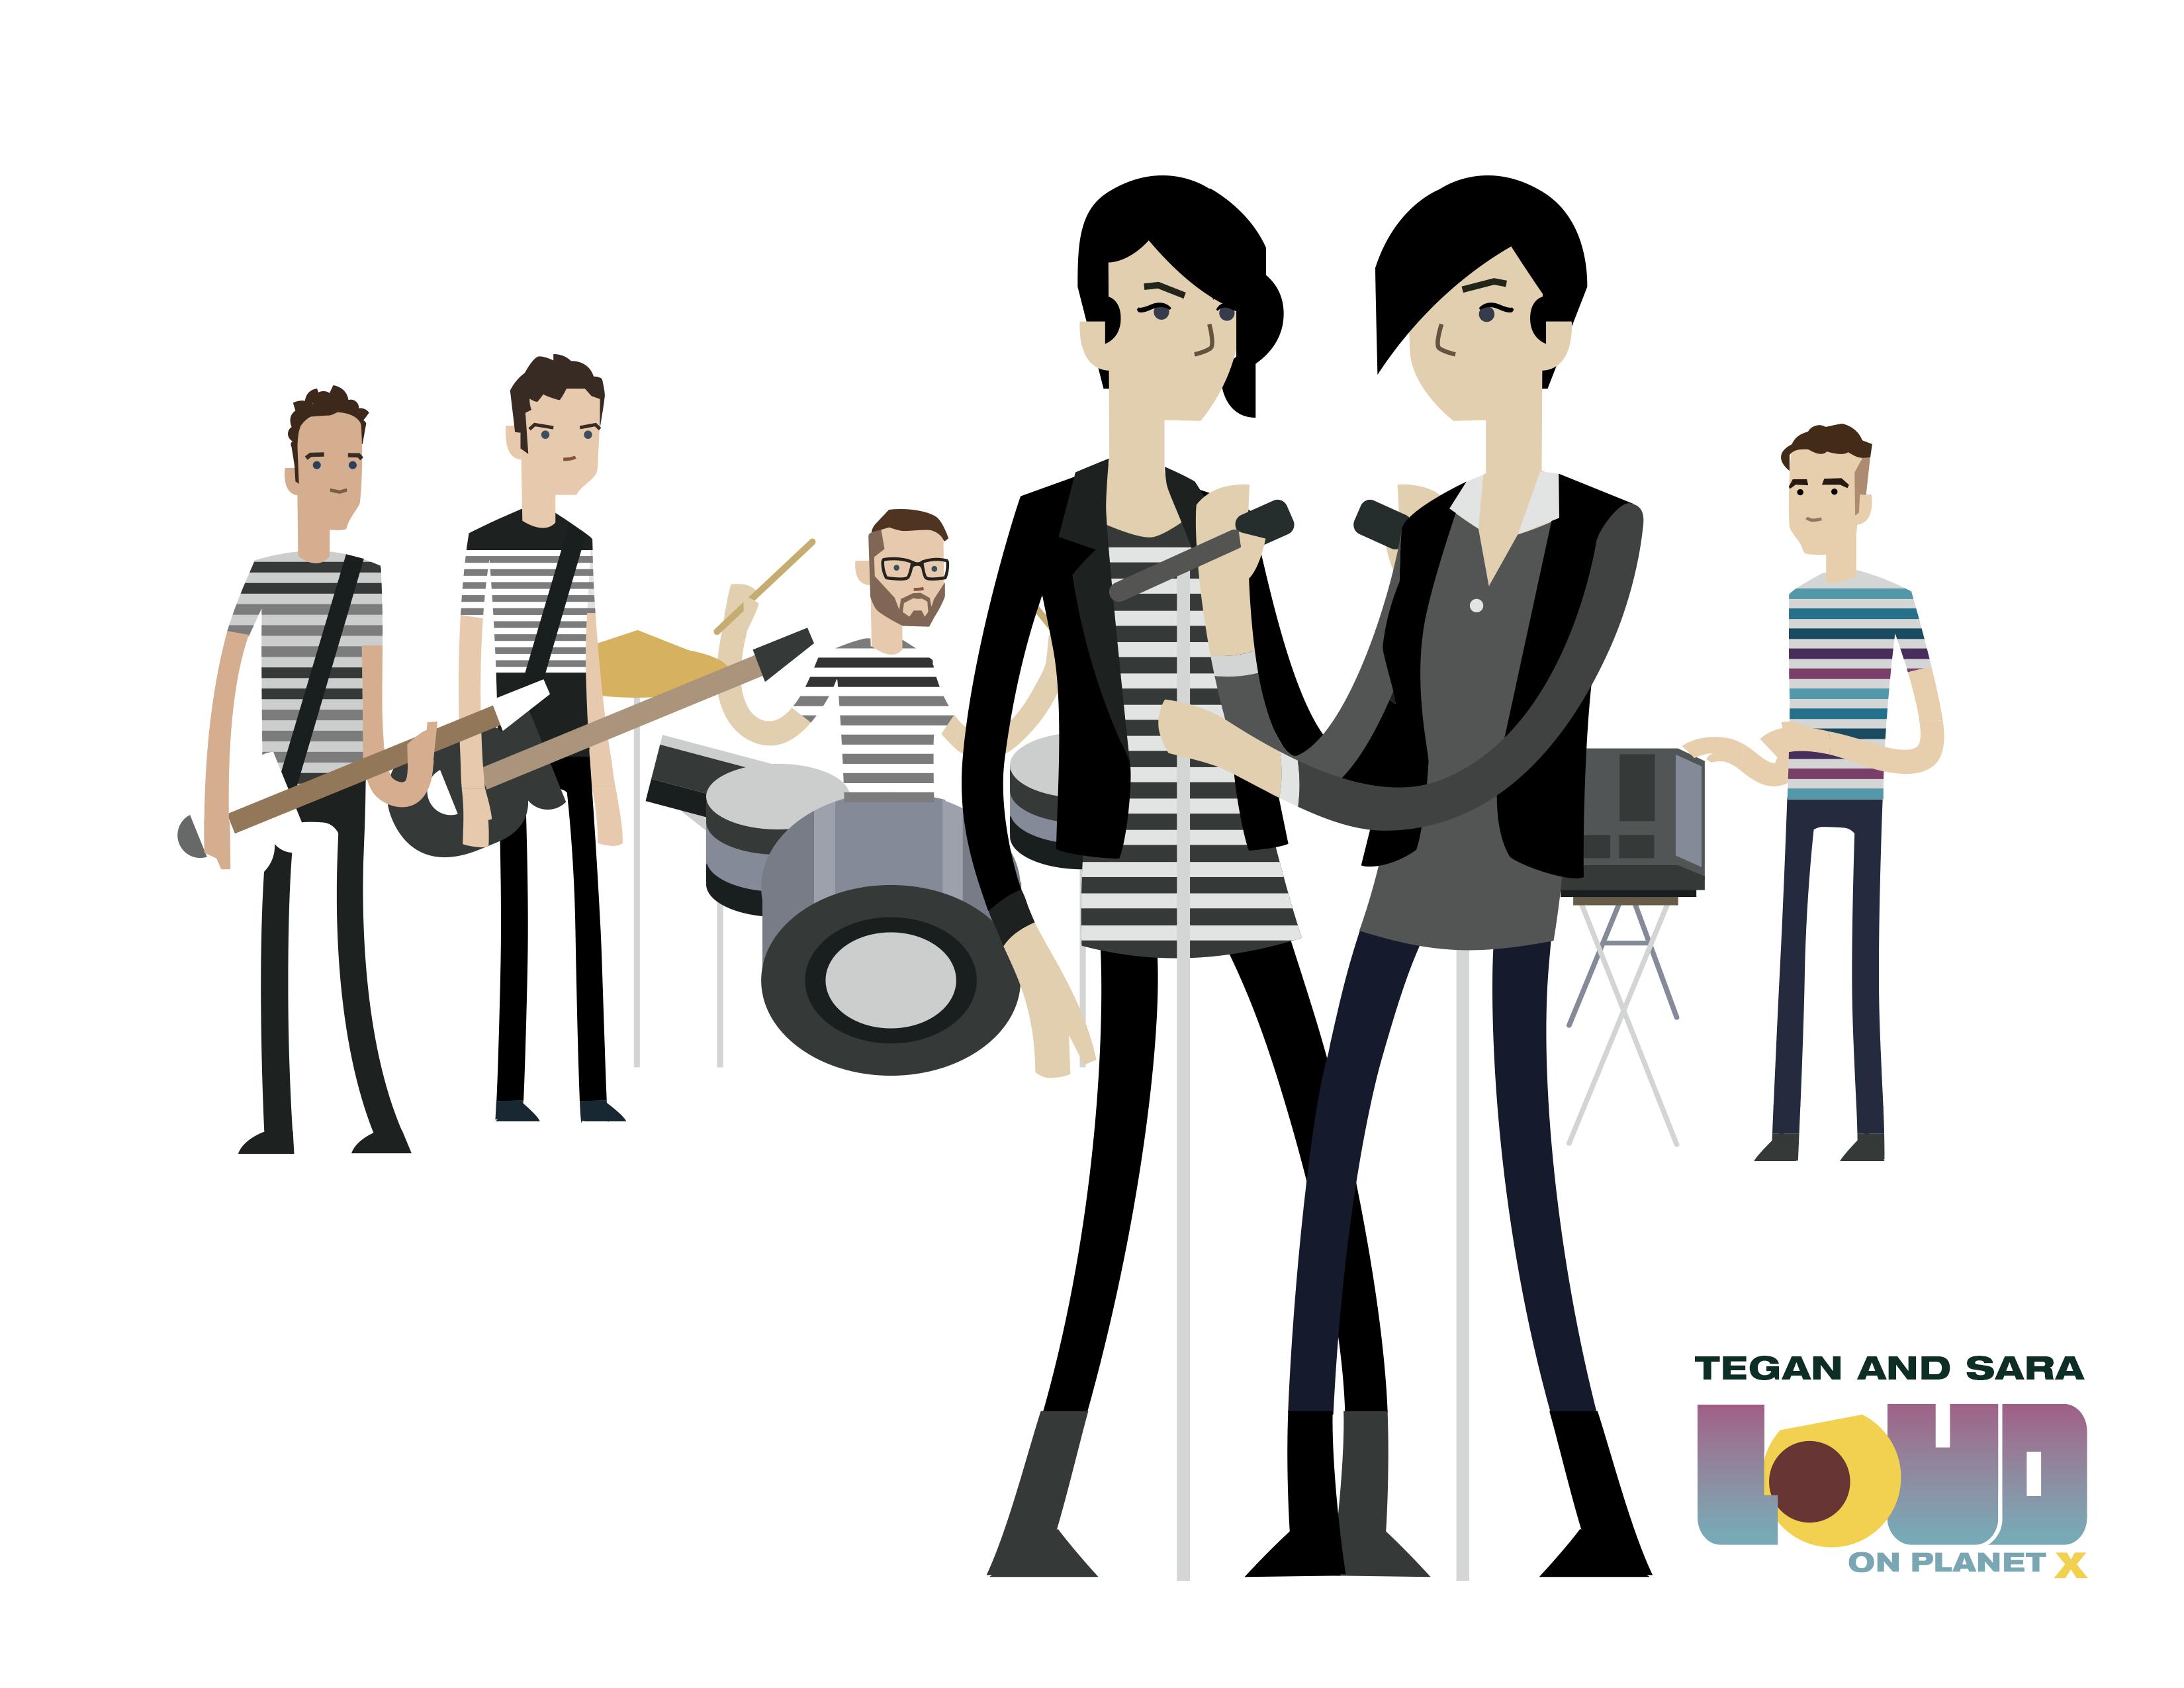 b10_LoPX_Kickstarter_PressKit_Artists_TeganSara.png.  b03a_LoPX_Kickstarter_PressKit_Artists_HEALTH.png - Pop Band PNG